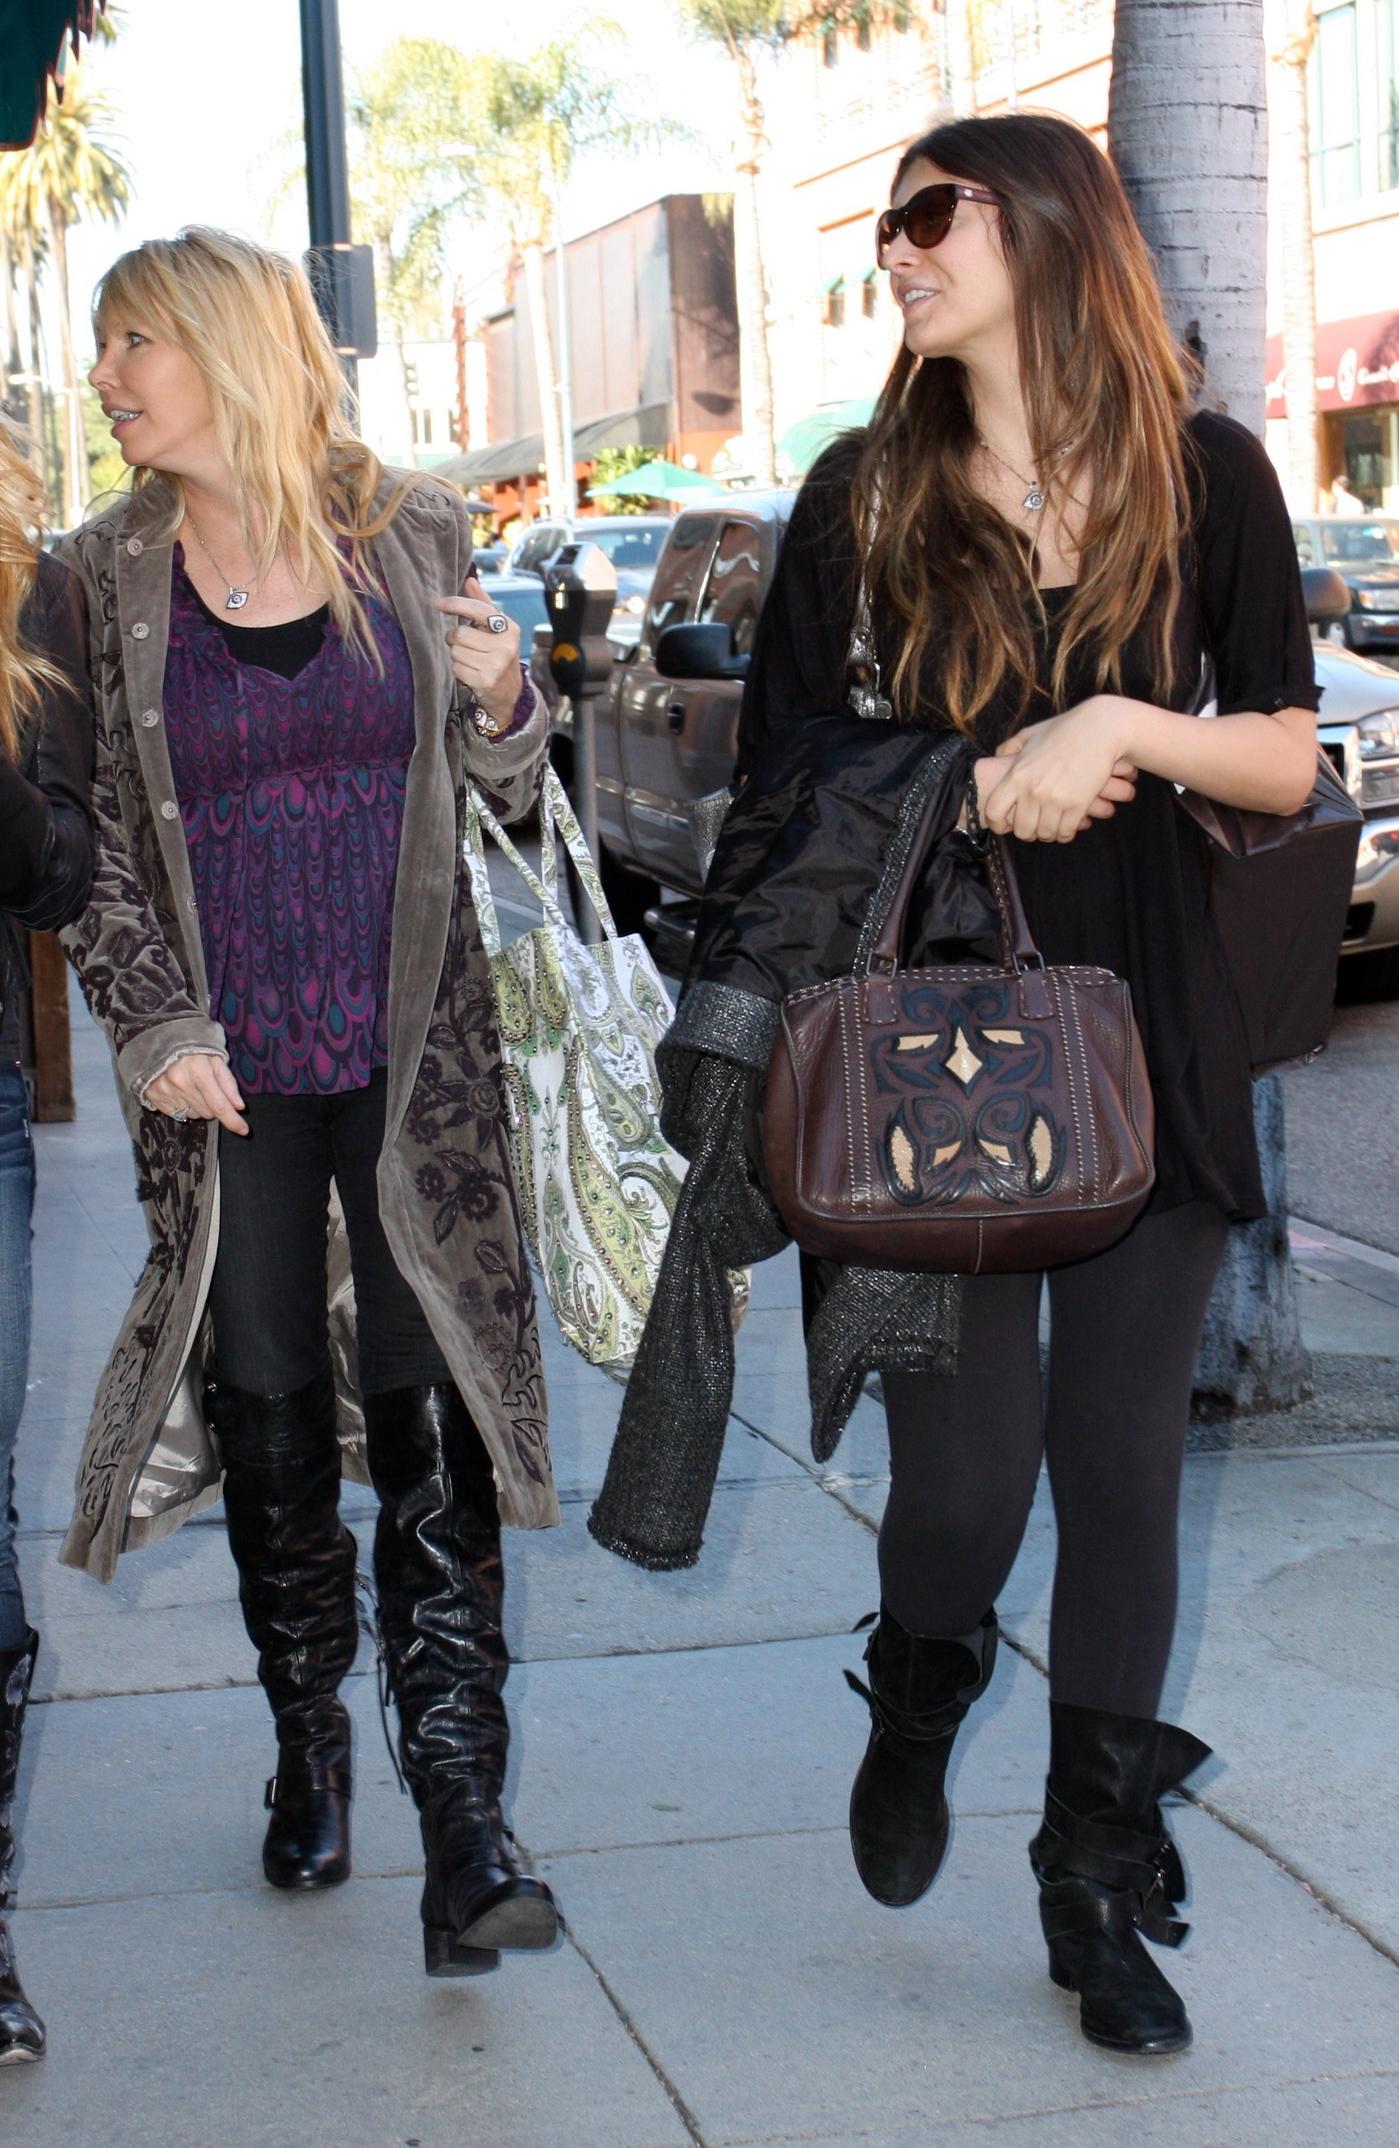 79399_celebrity-paradise.com-The_Elder-Brittny_Gastineau_2010-02-03_-_shopping_in_Beverly_Hills_852_122_167lo.jpg